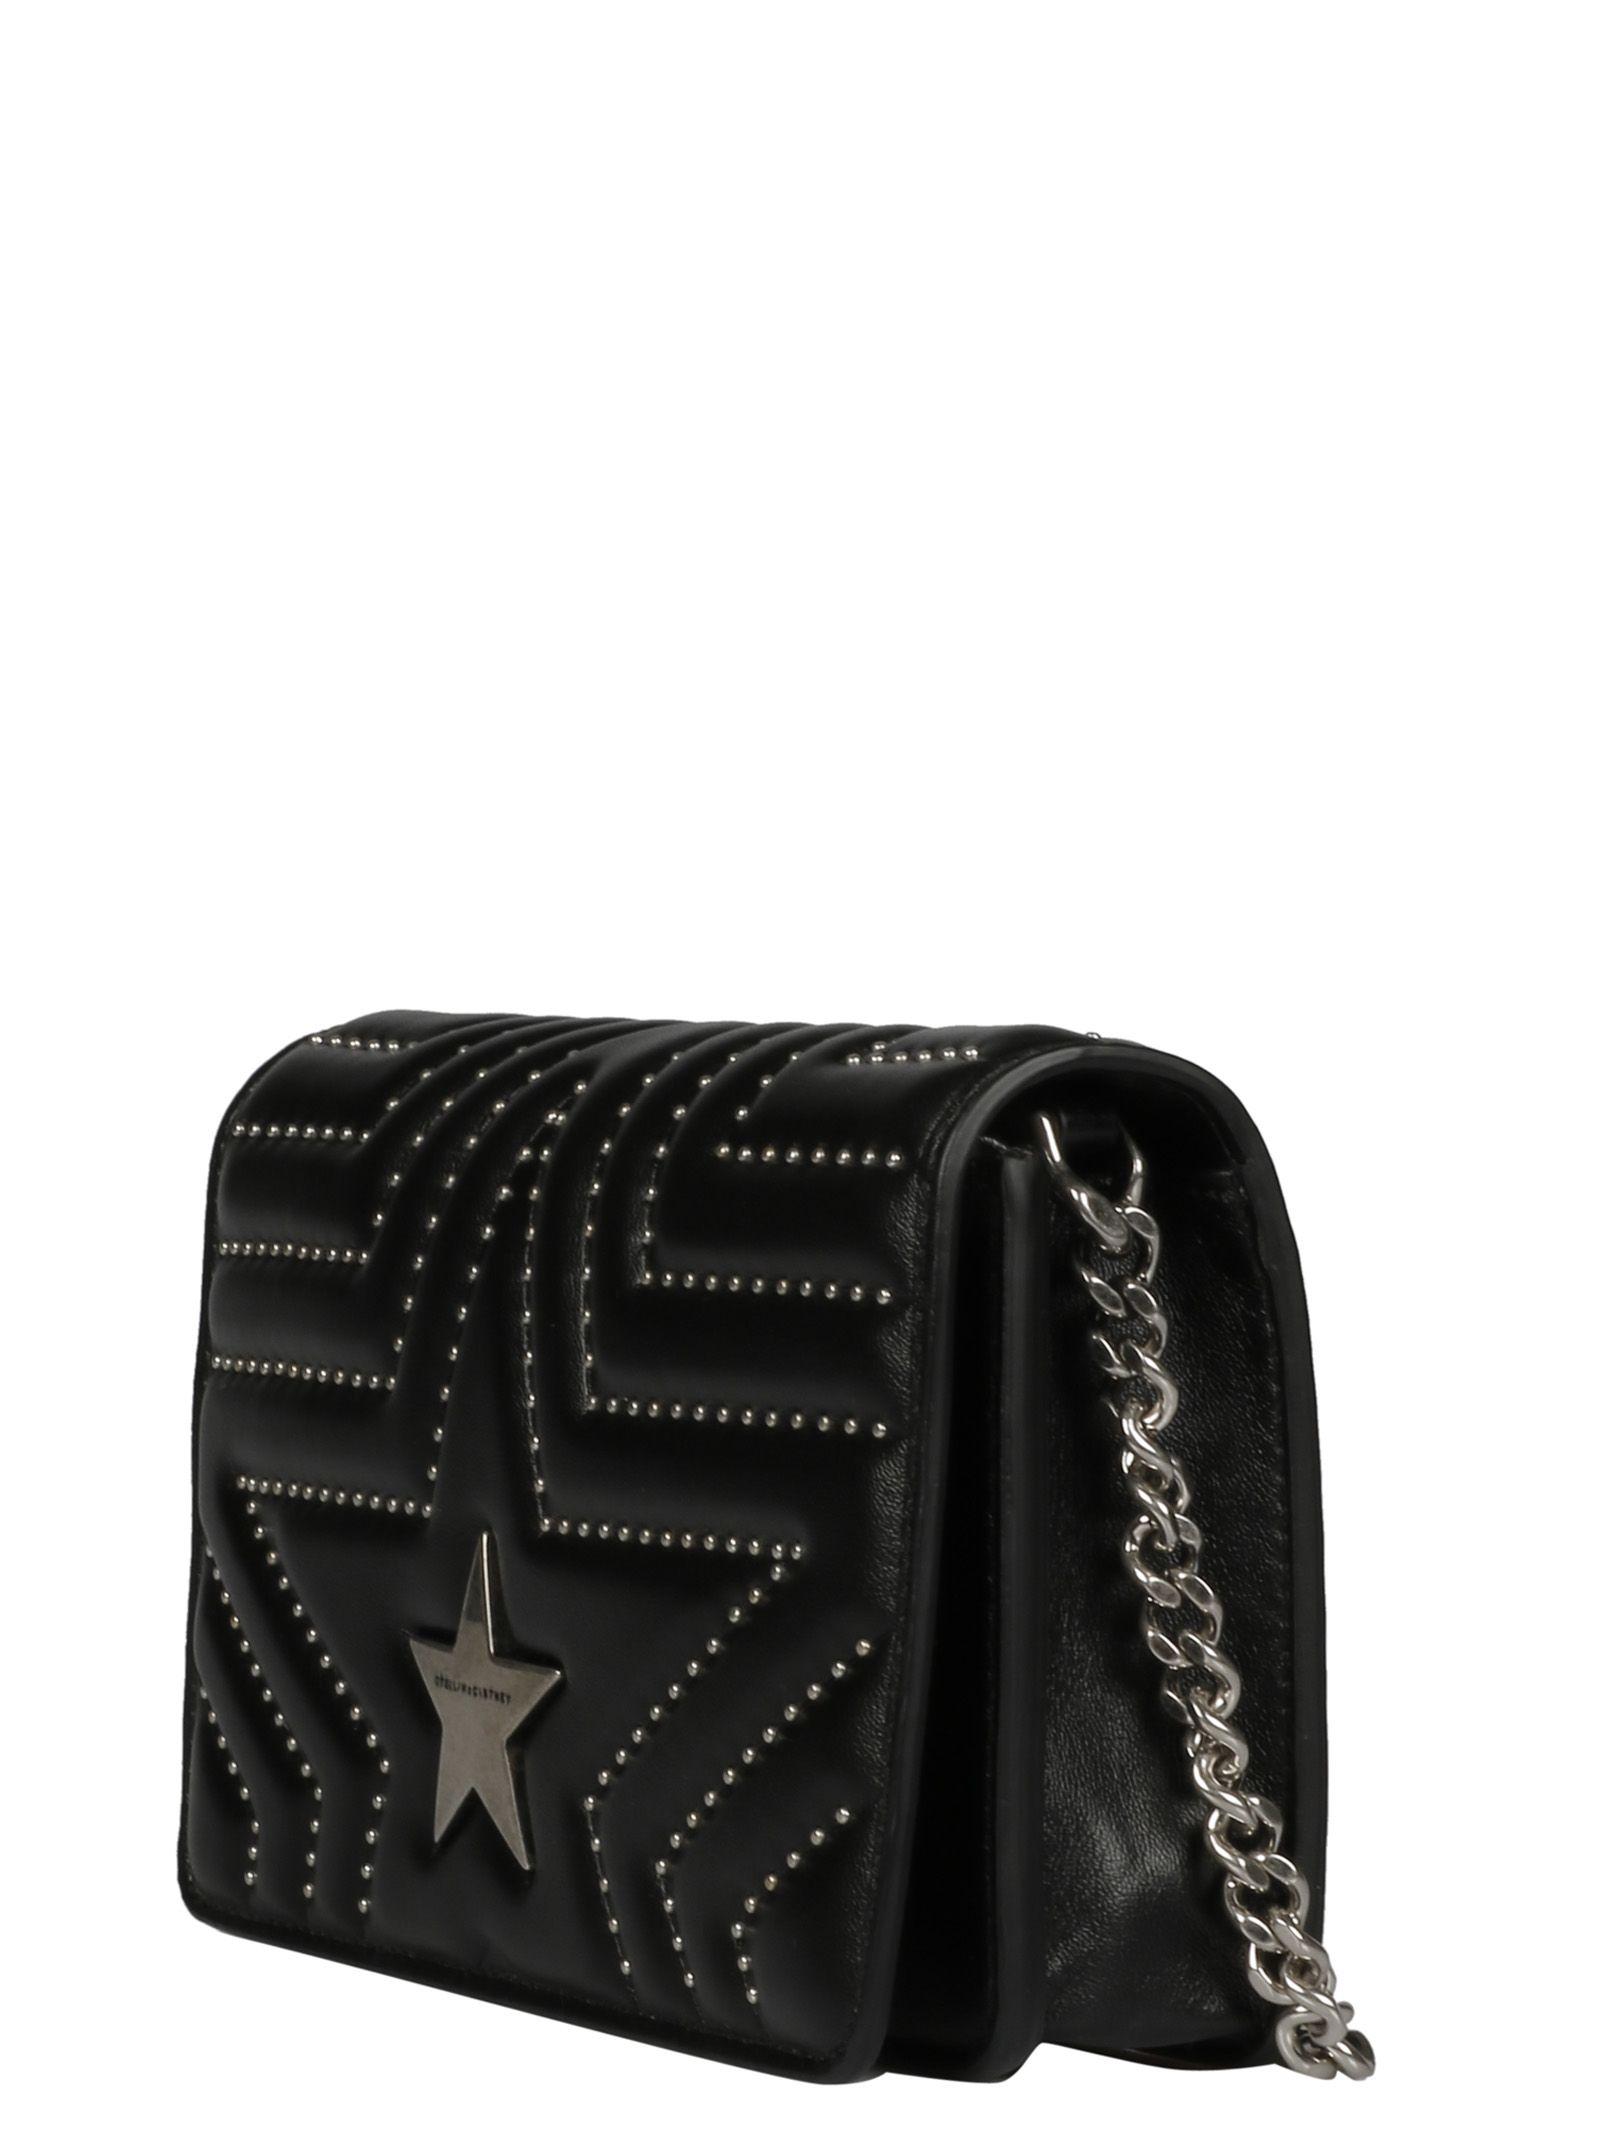 0a9a81019454 ... Stella McCartney Star Quilted Shoulder Bag - 1000 ...